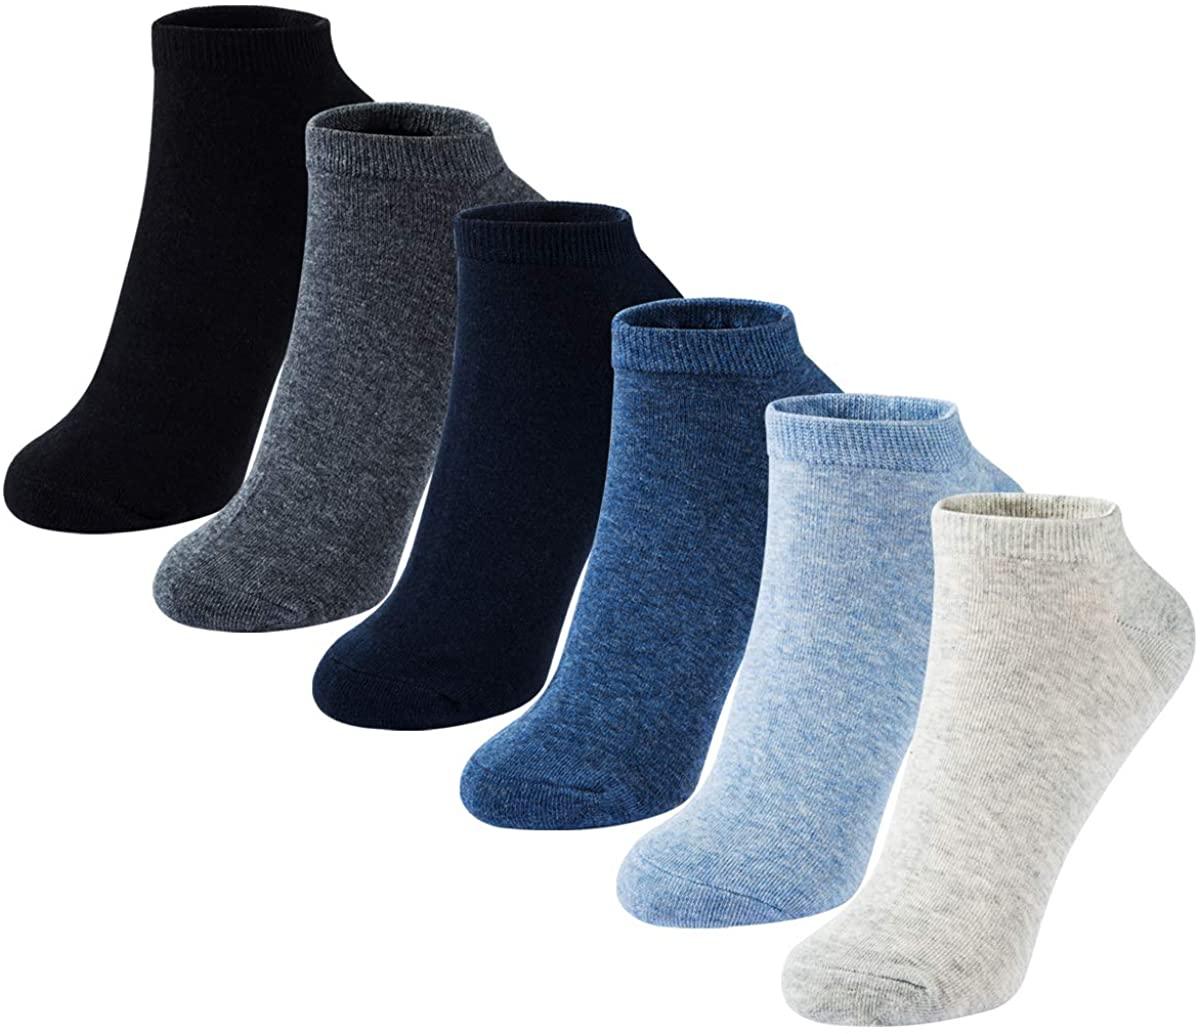 Socks Women Crew Casual Socks Low Cut Ladies Cotton Comfort Athletic Socks by MAGIARTE